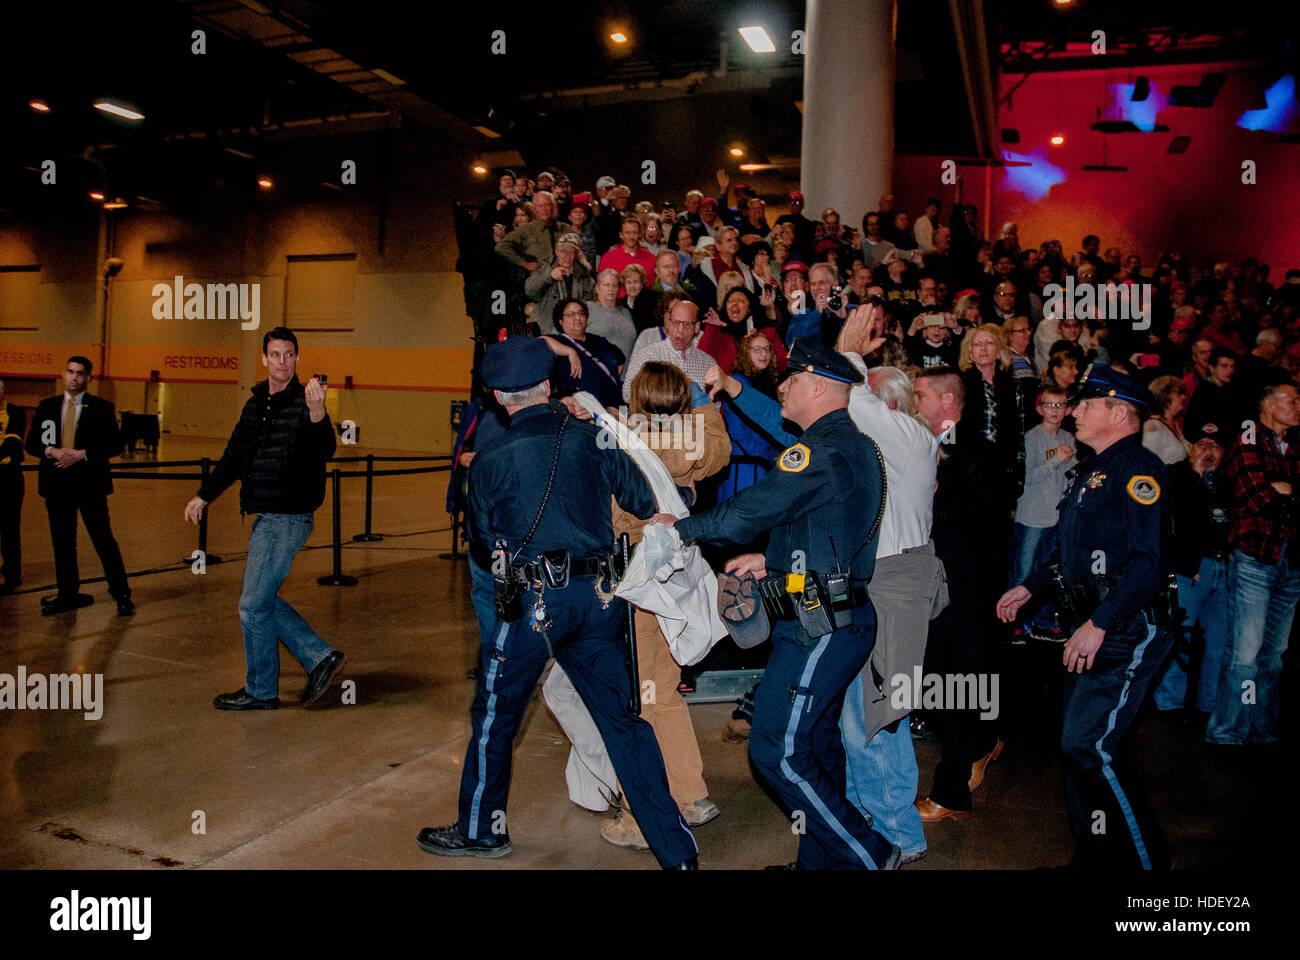 Des Moines Escort >> Des Moines Iowa Usa 8th December 2016 Des Moines Police Officers